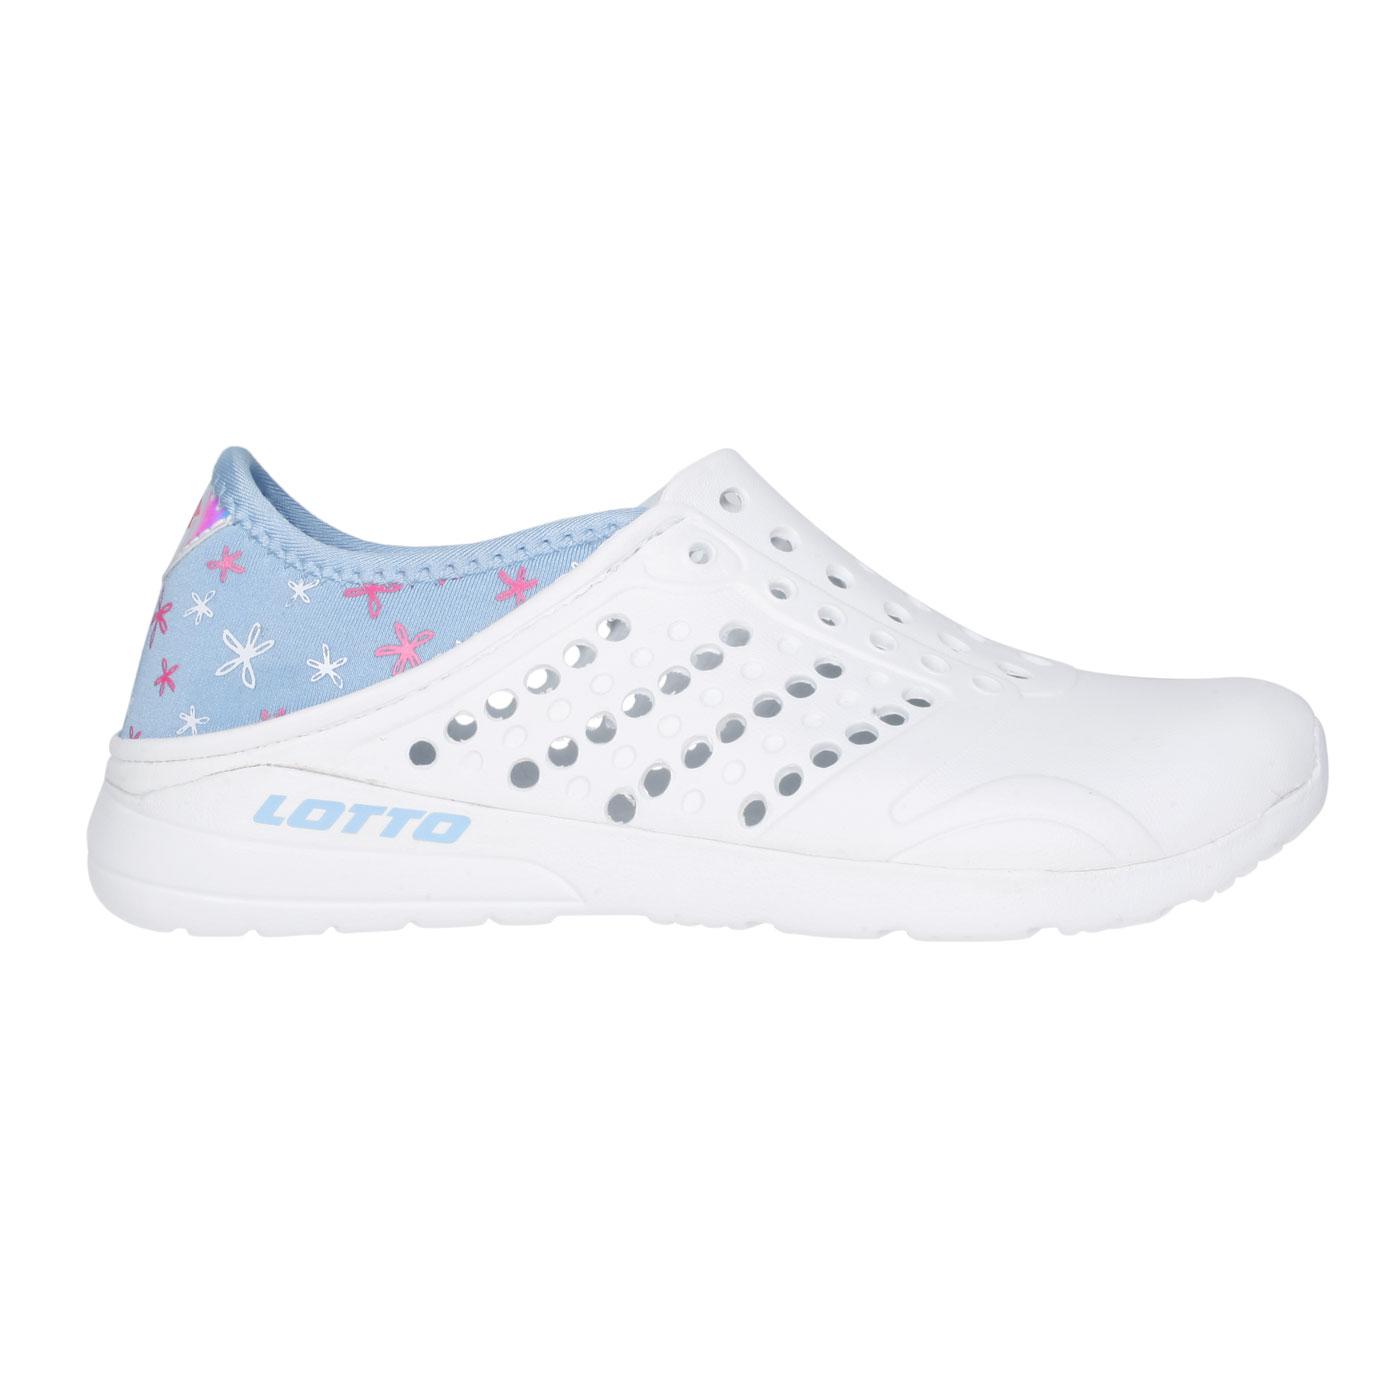 LOTTO 中童時尚洞洞鞋 LT1AKS3636 - 白水藍